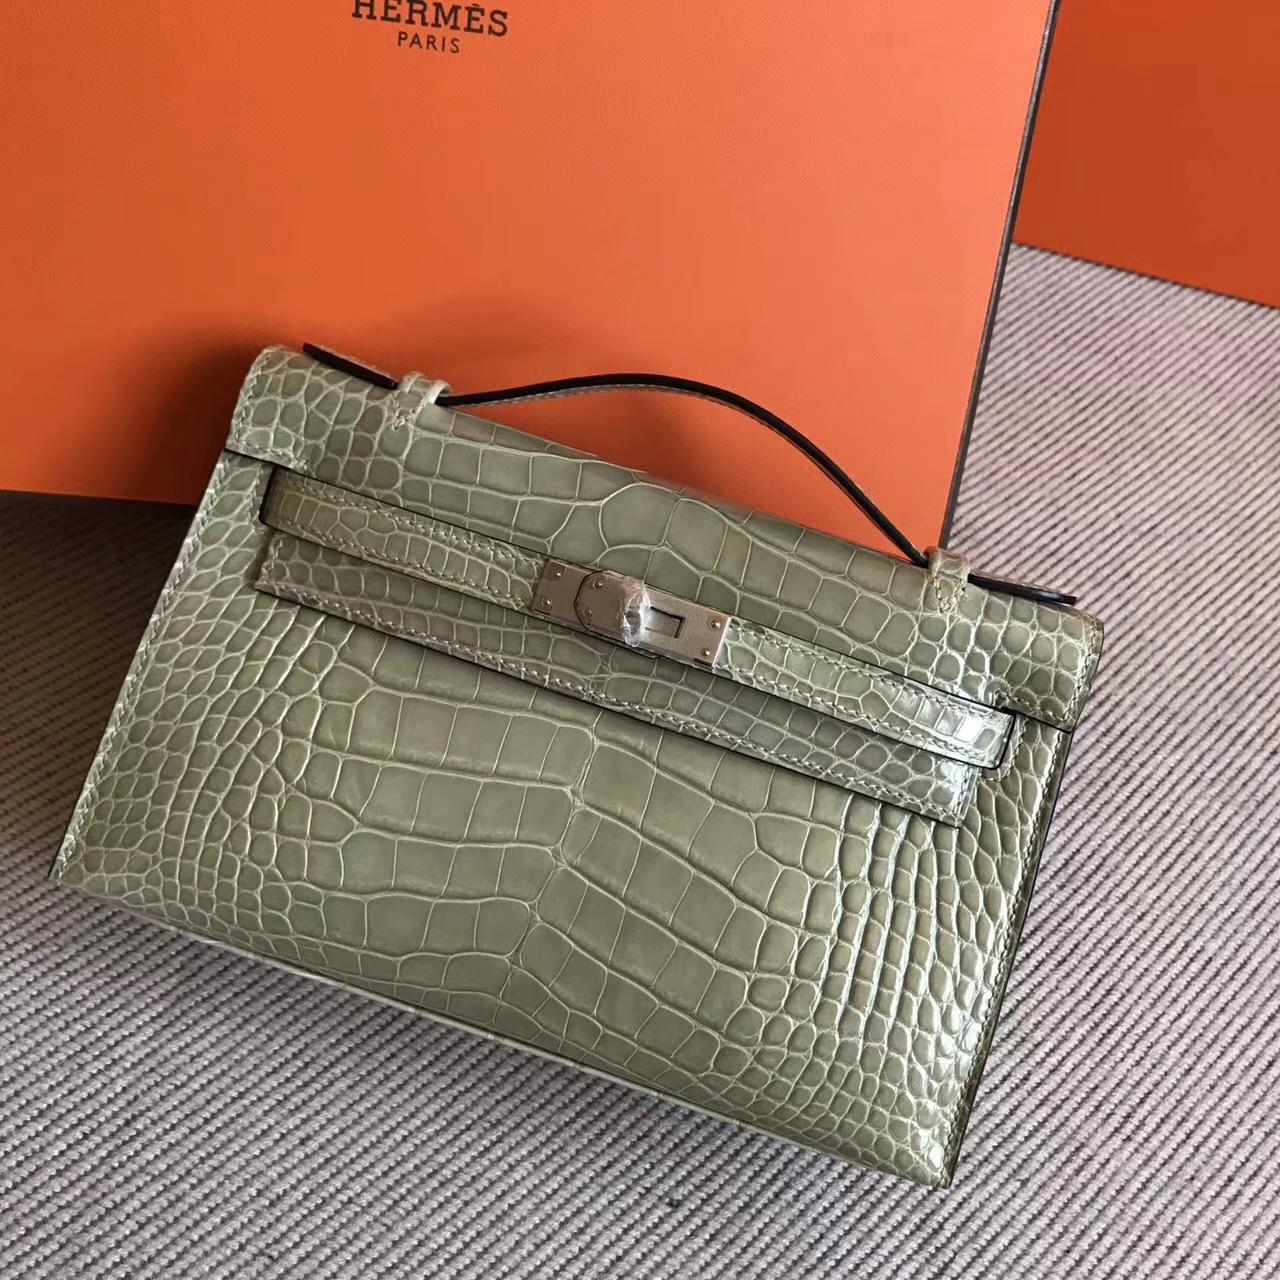 Luxury Hermes Shiny Crocodile Leather Minikelly22cm in CK81Gris Tourterelle